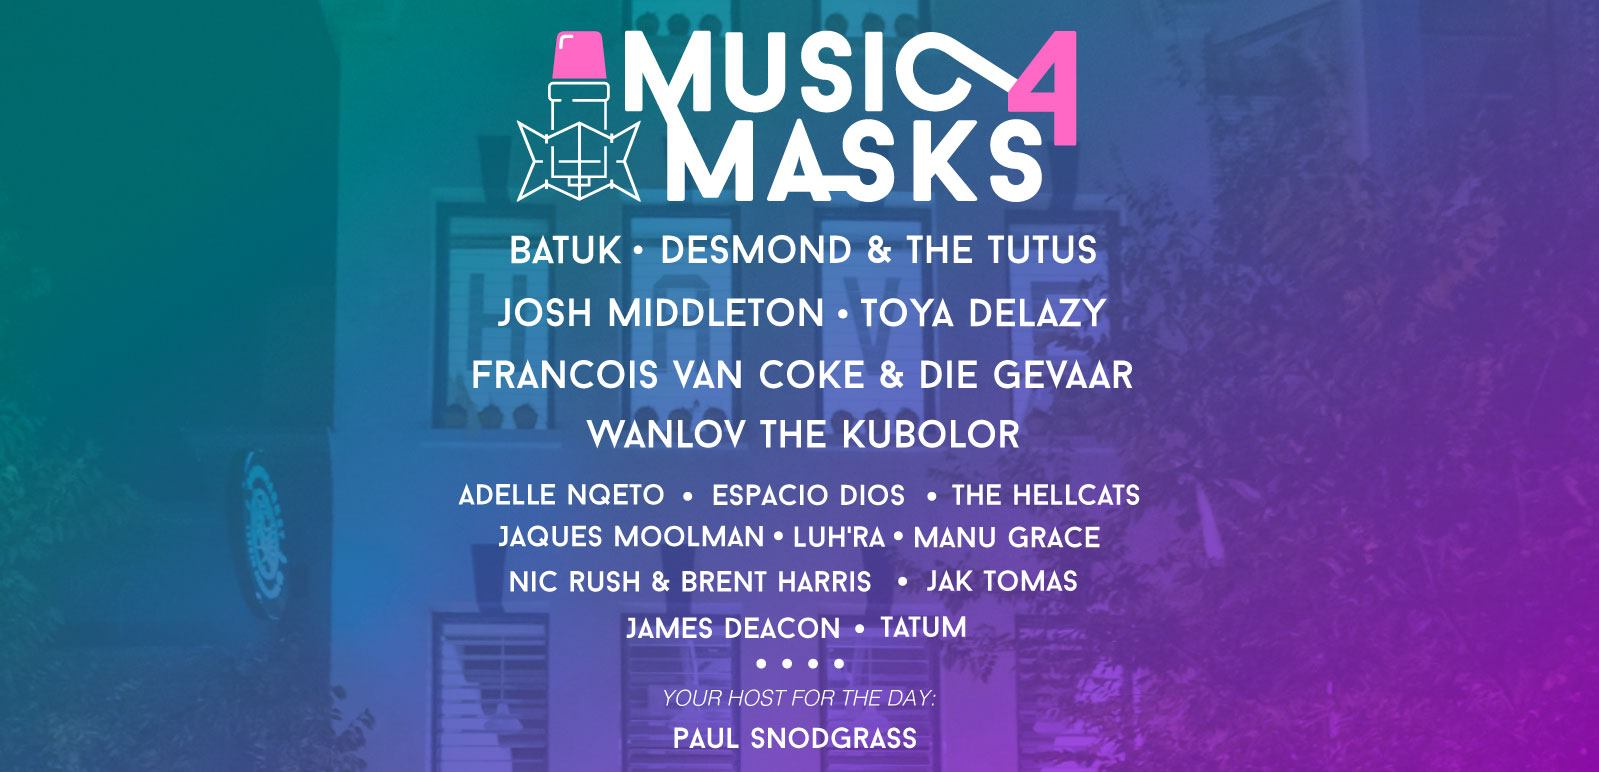 Music4Masks